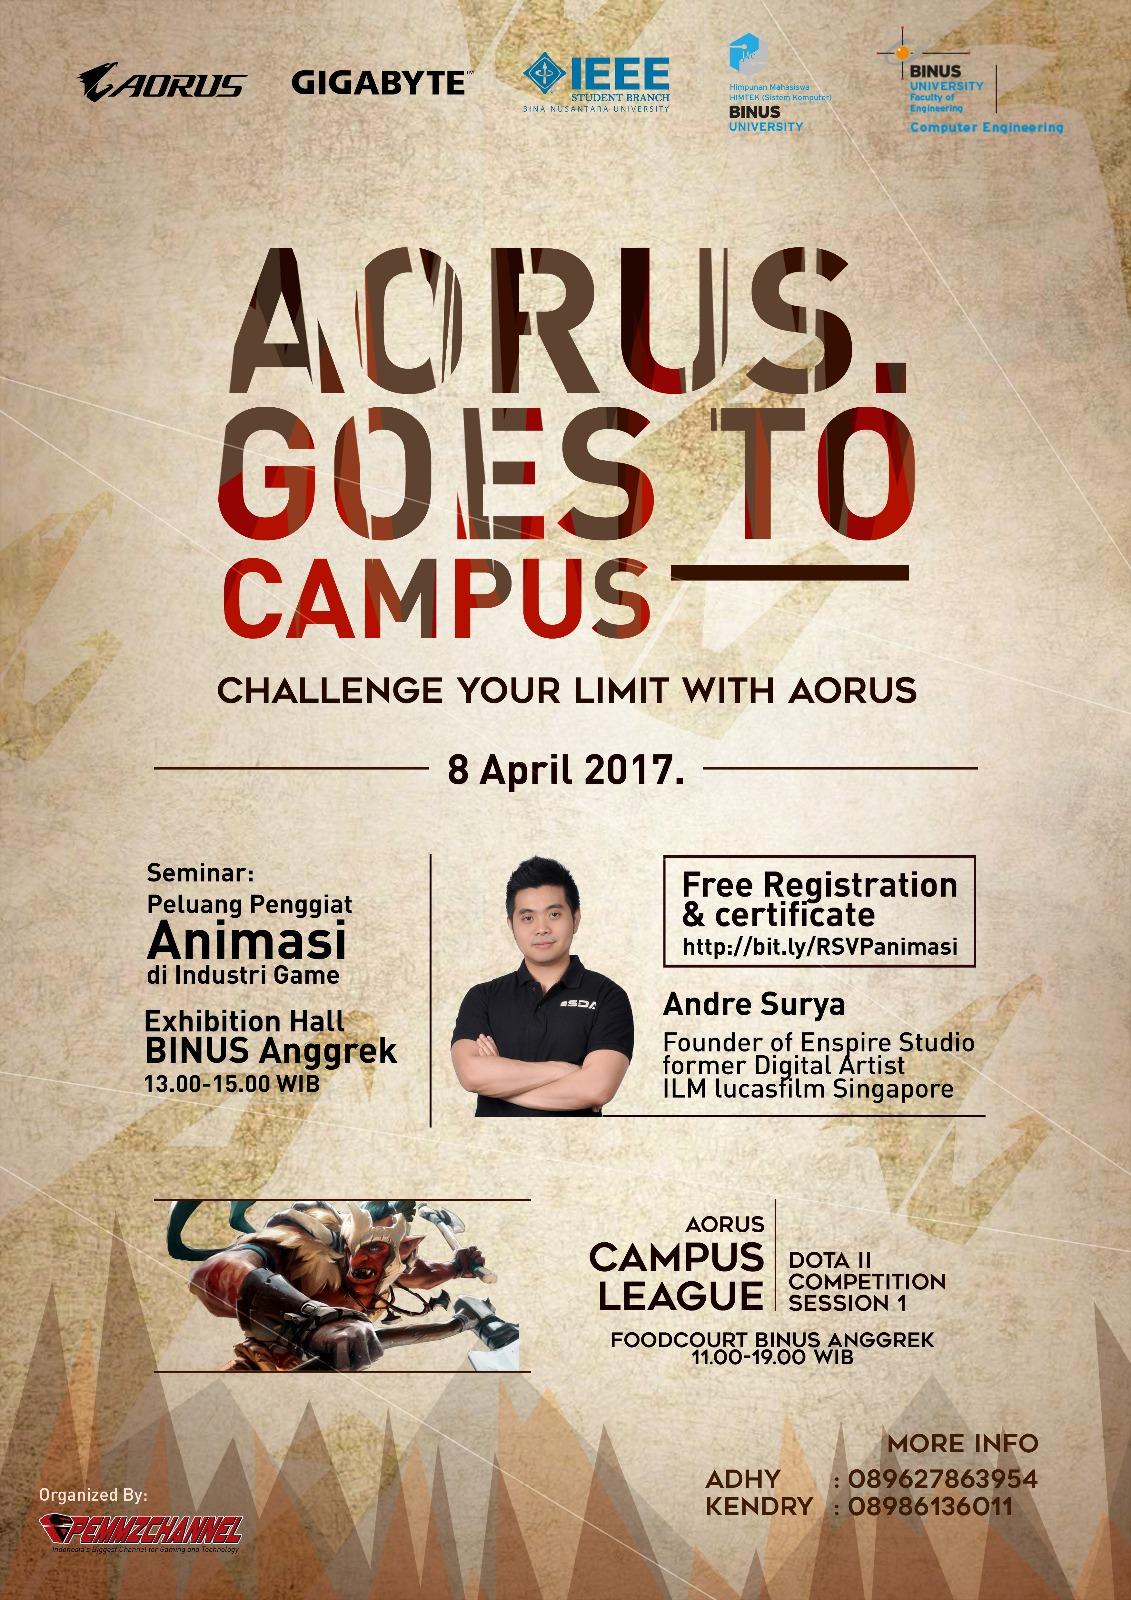 Aorus Campus League 2017